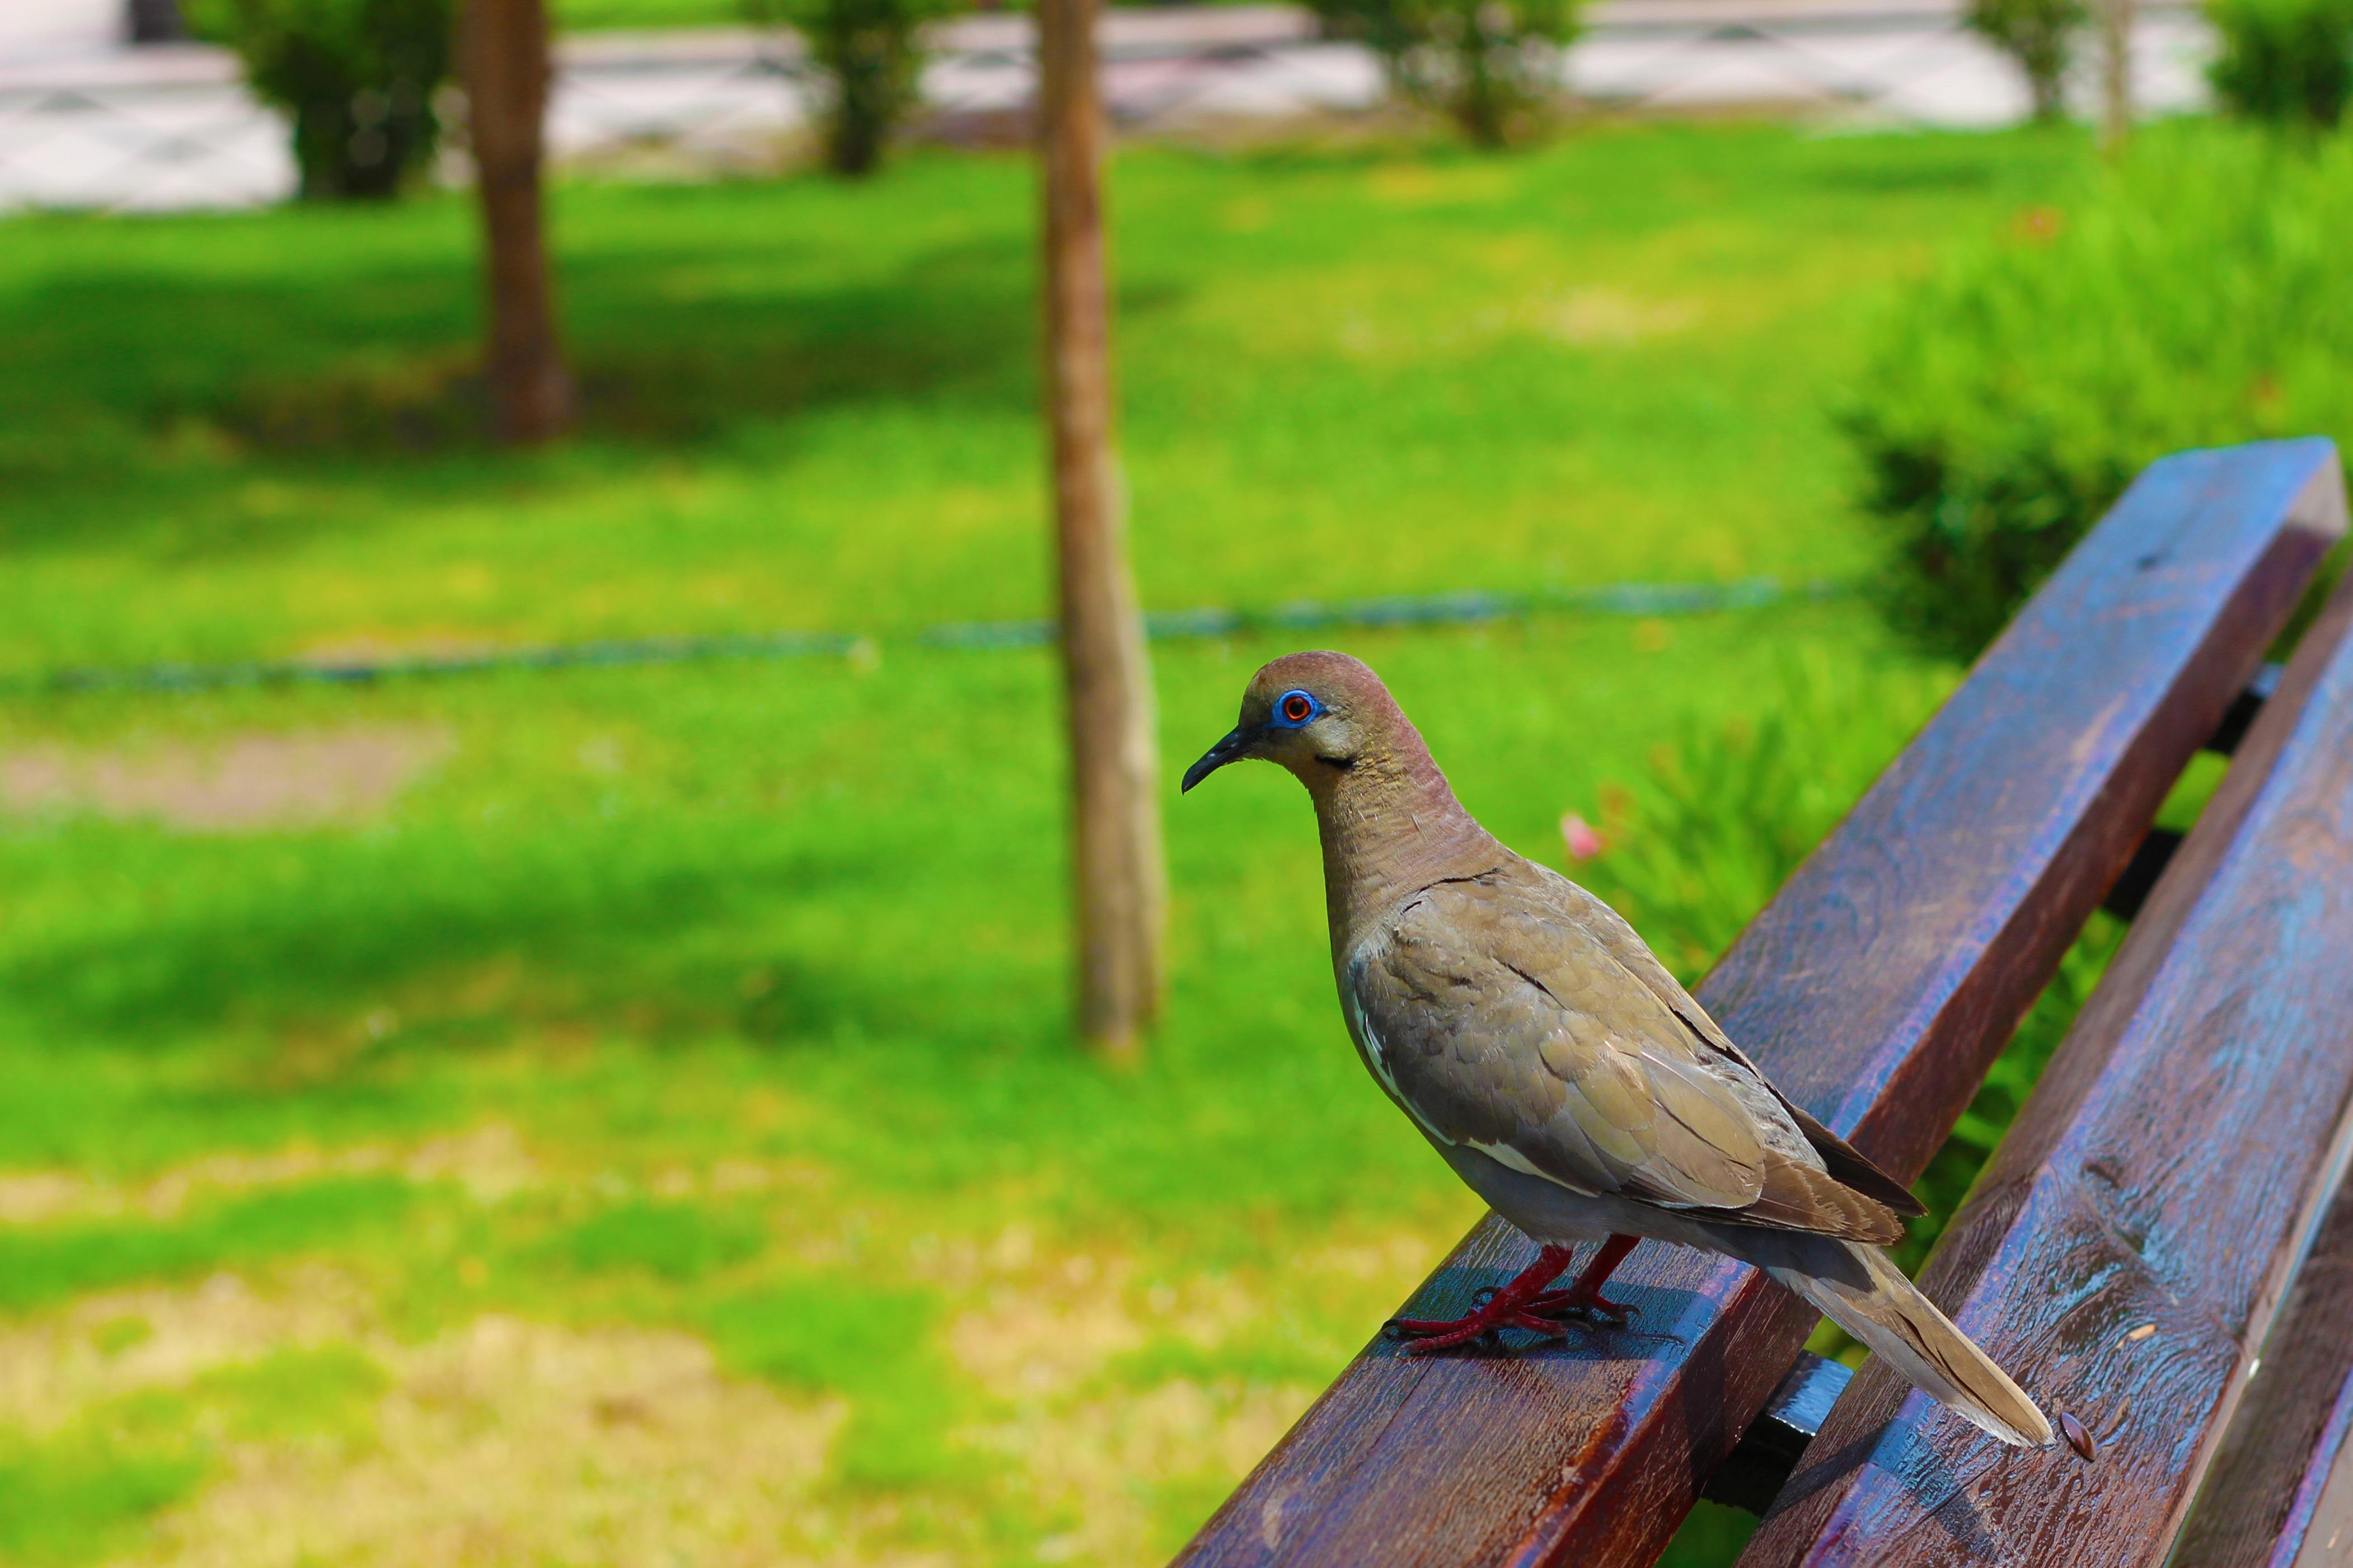 1050+ Gambar Binatang Burung Kecil HD